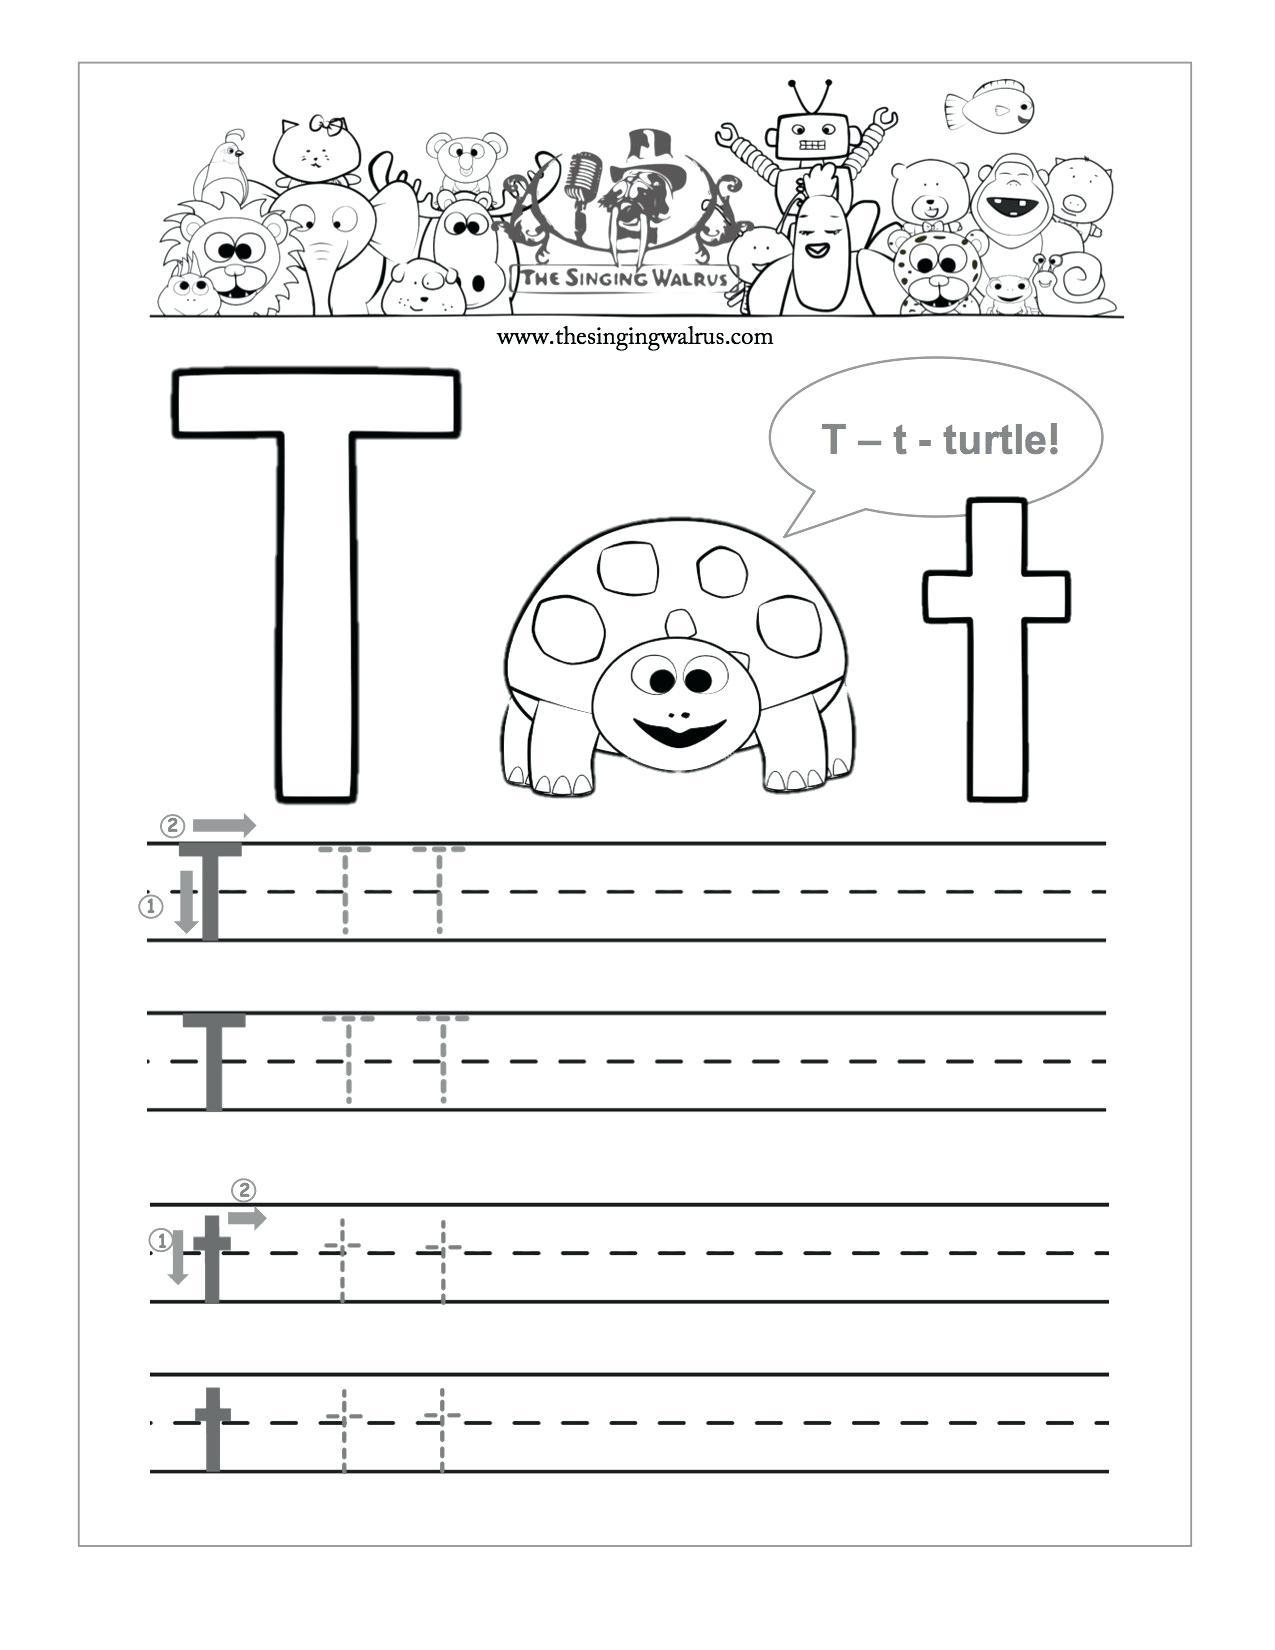 Preschool Letter Tracing Sheets Free Printable Preschool Worksheets - Free Printable Traceable Letters